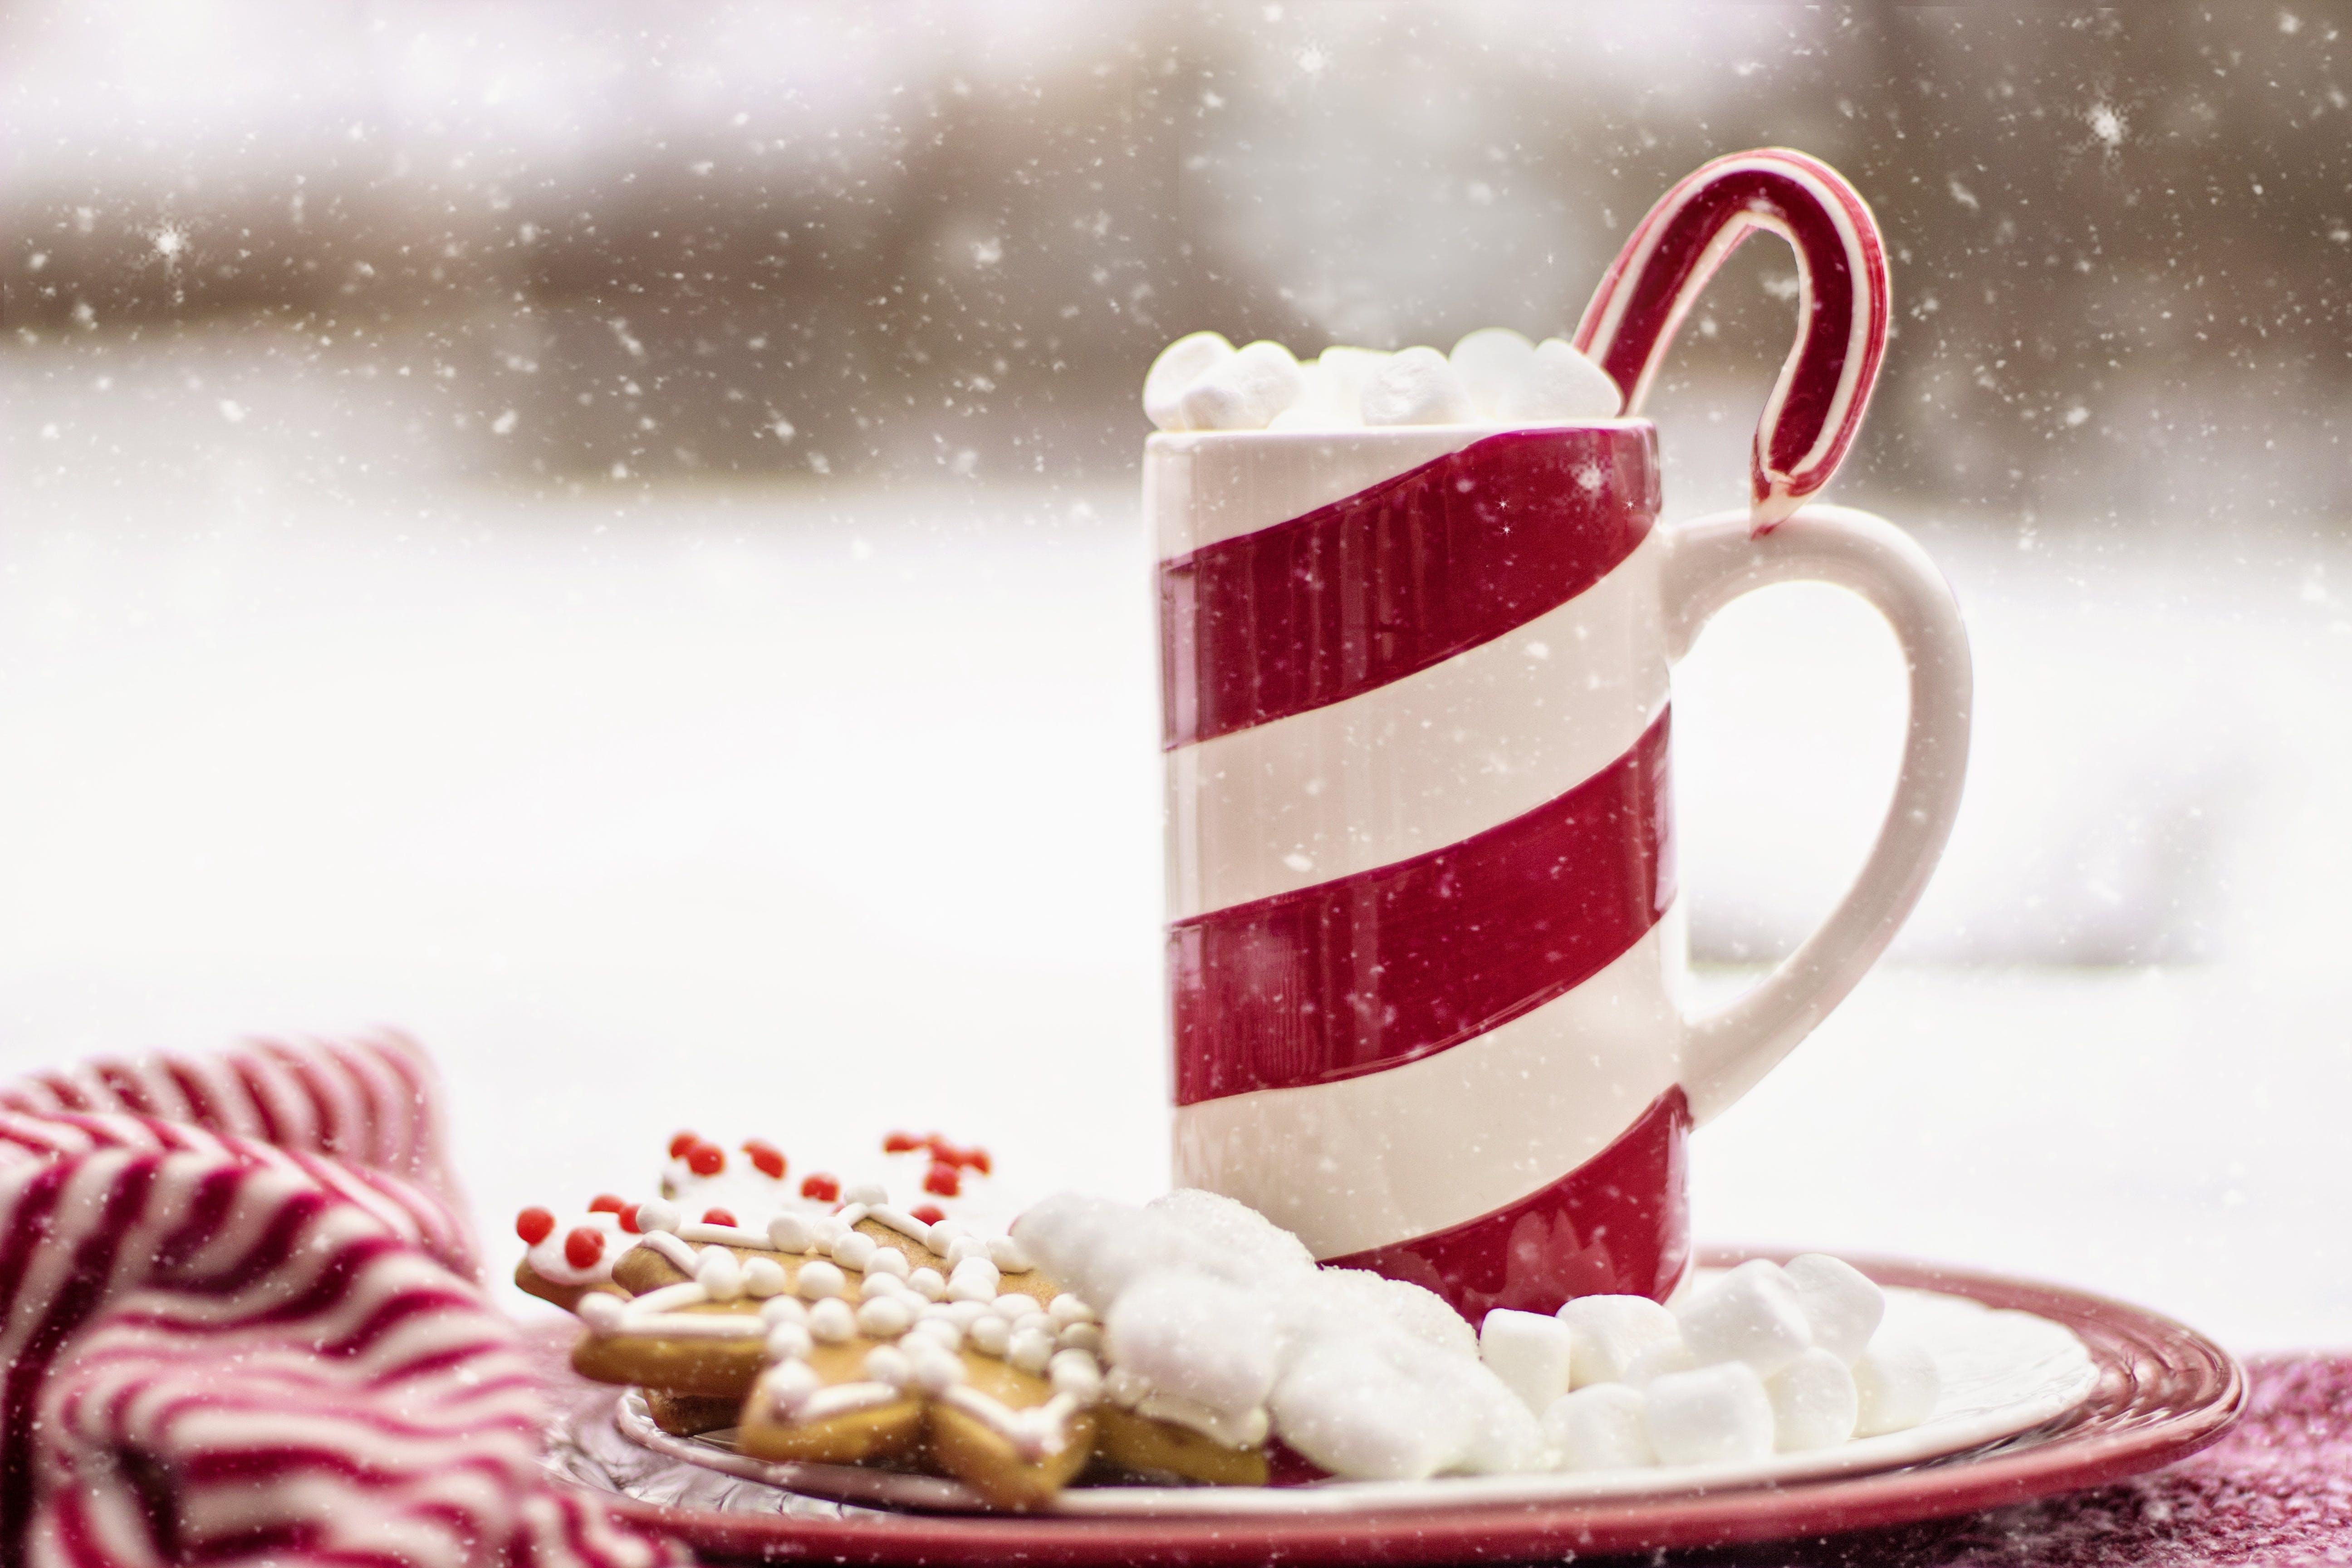 Kostenloses Stock Foto zu becher, cookies, dessert, erfrischung